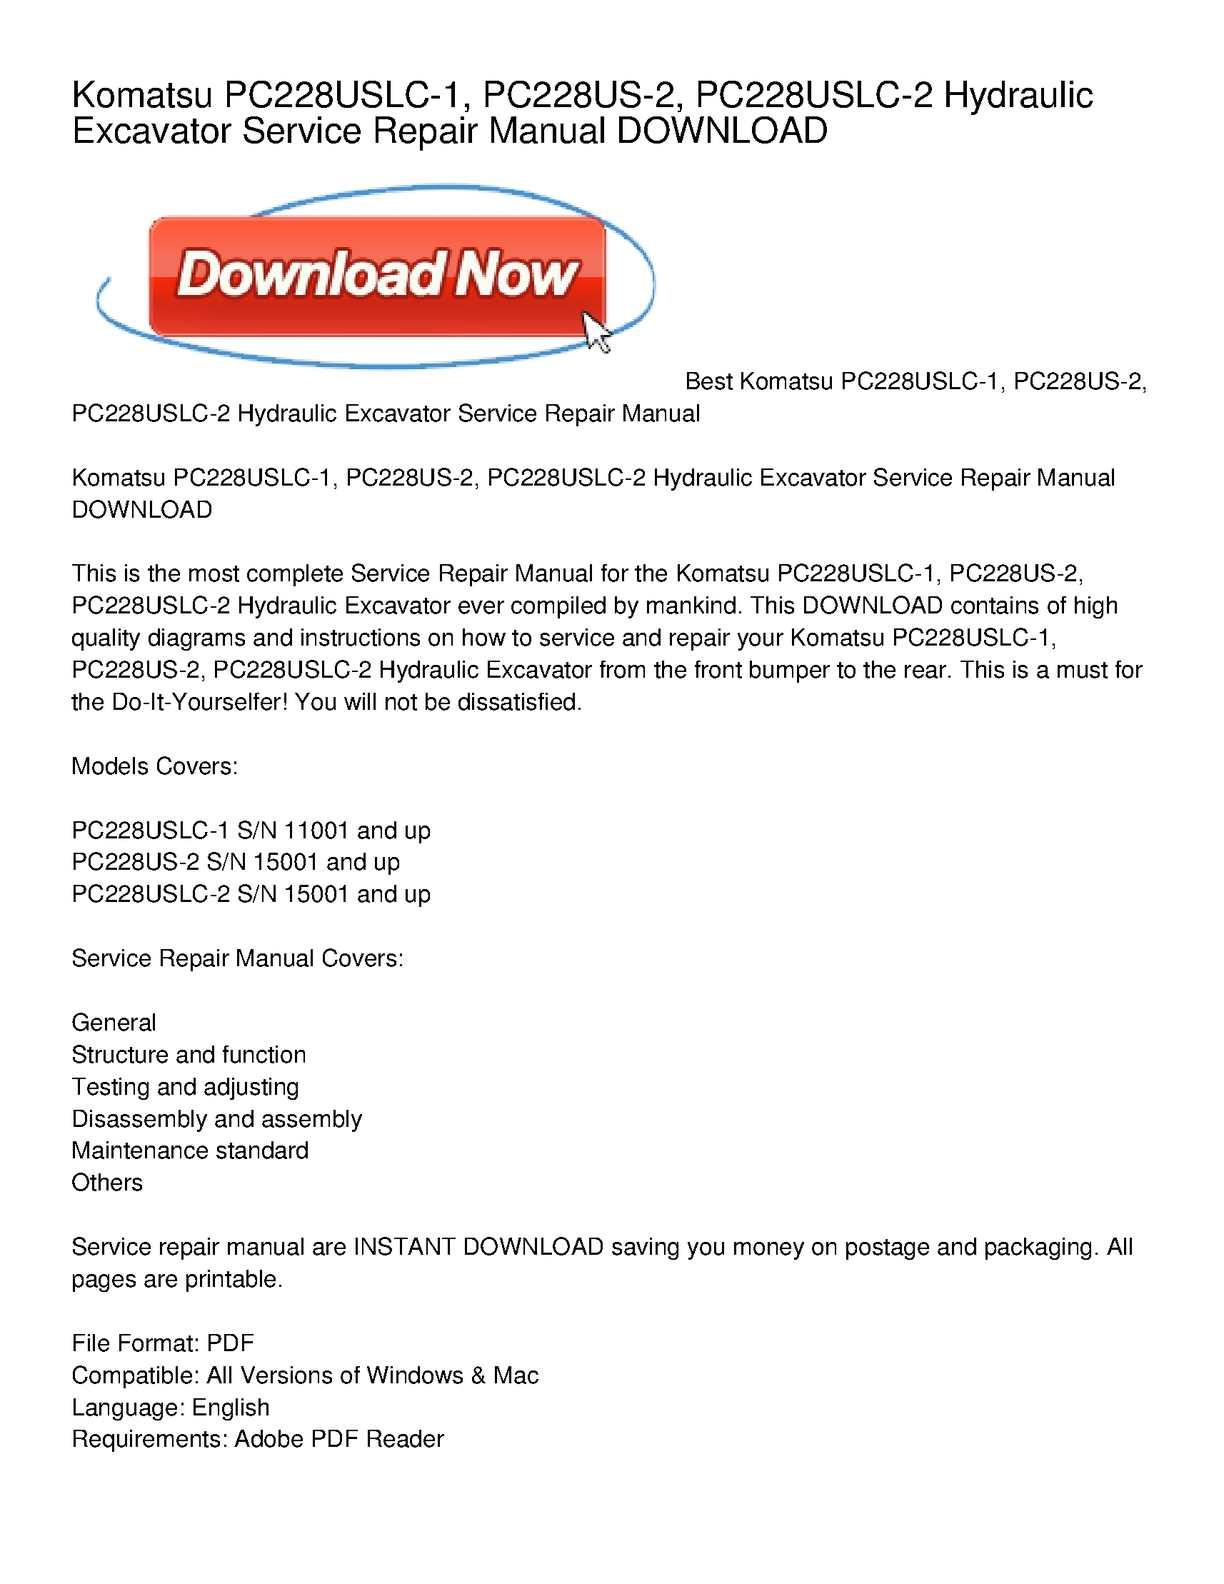 Calaméo - Komatsu PC228USLC-1, PC228US-2, PC228USLC-2 Hydraulic Excavator  Service Repair Manual DOWNLOAD